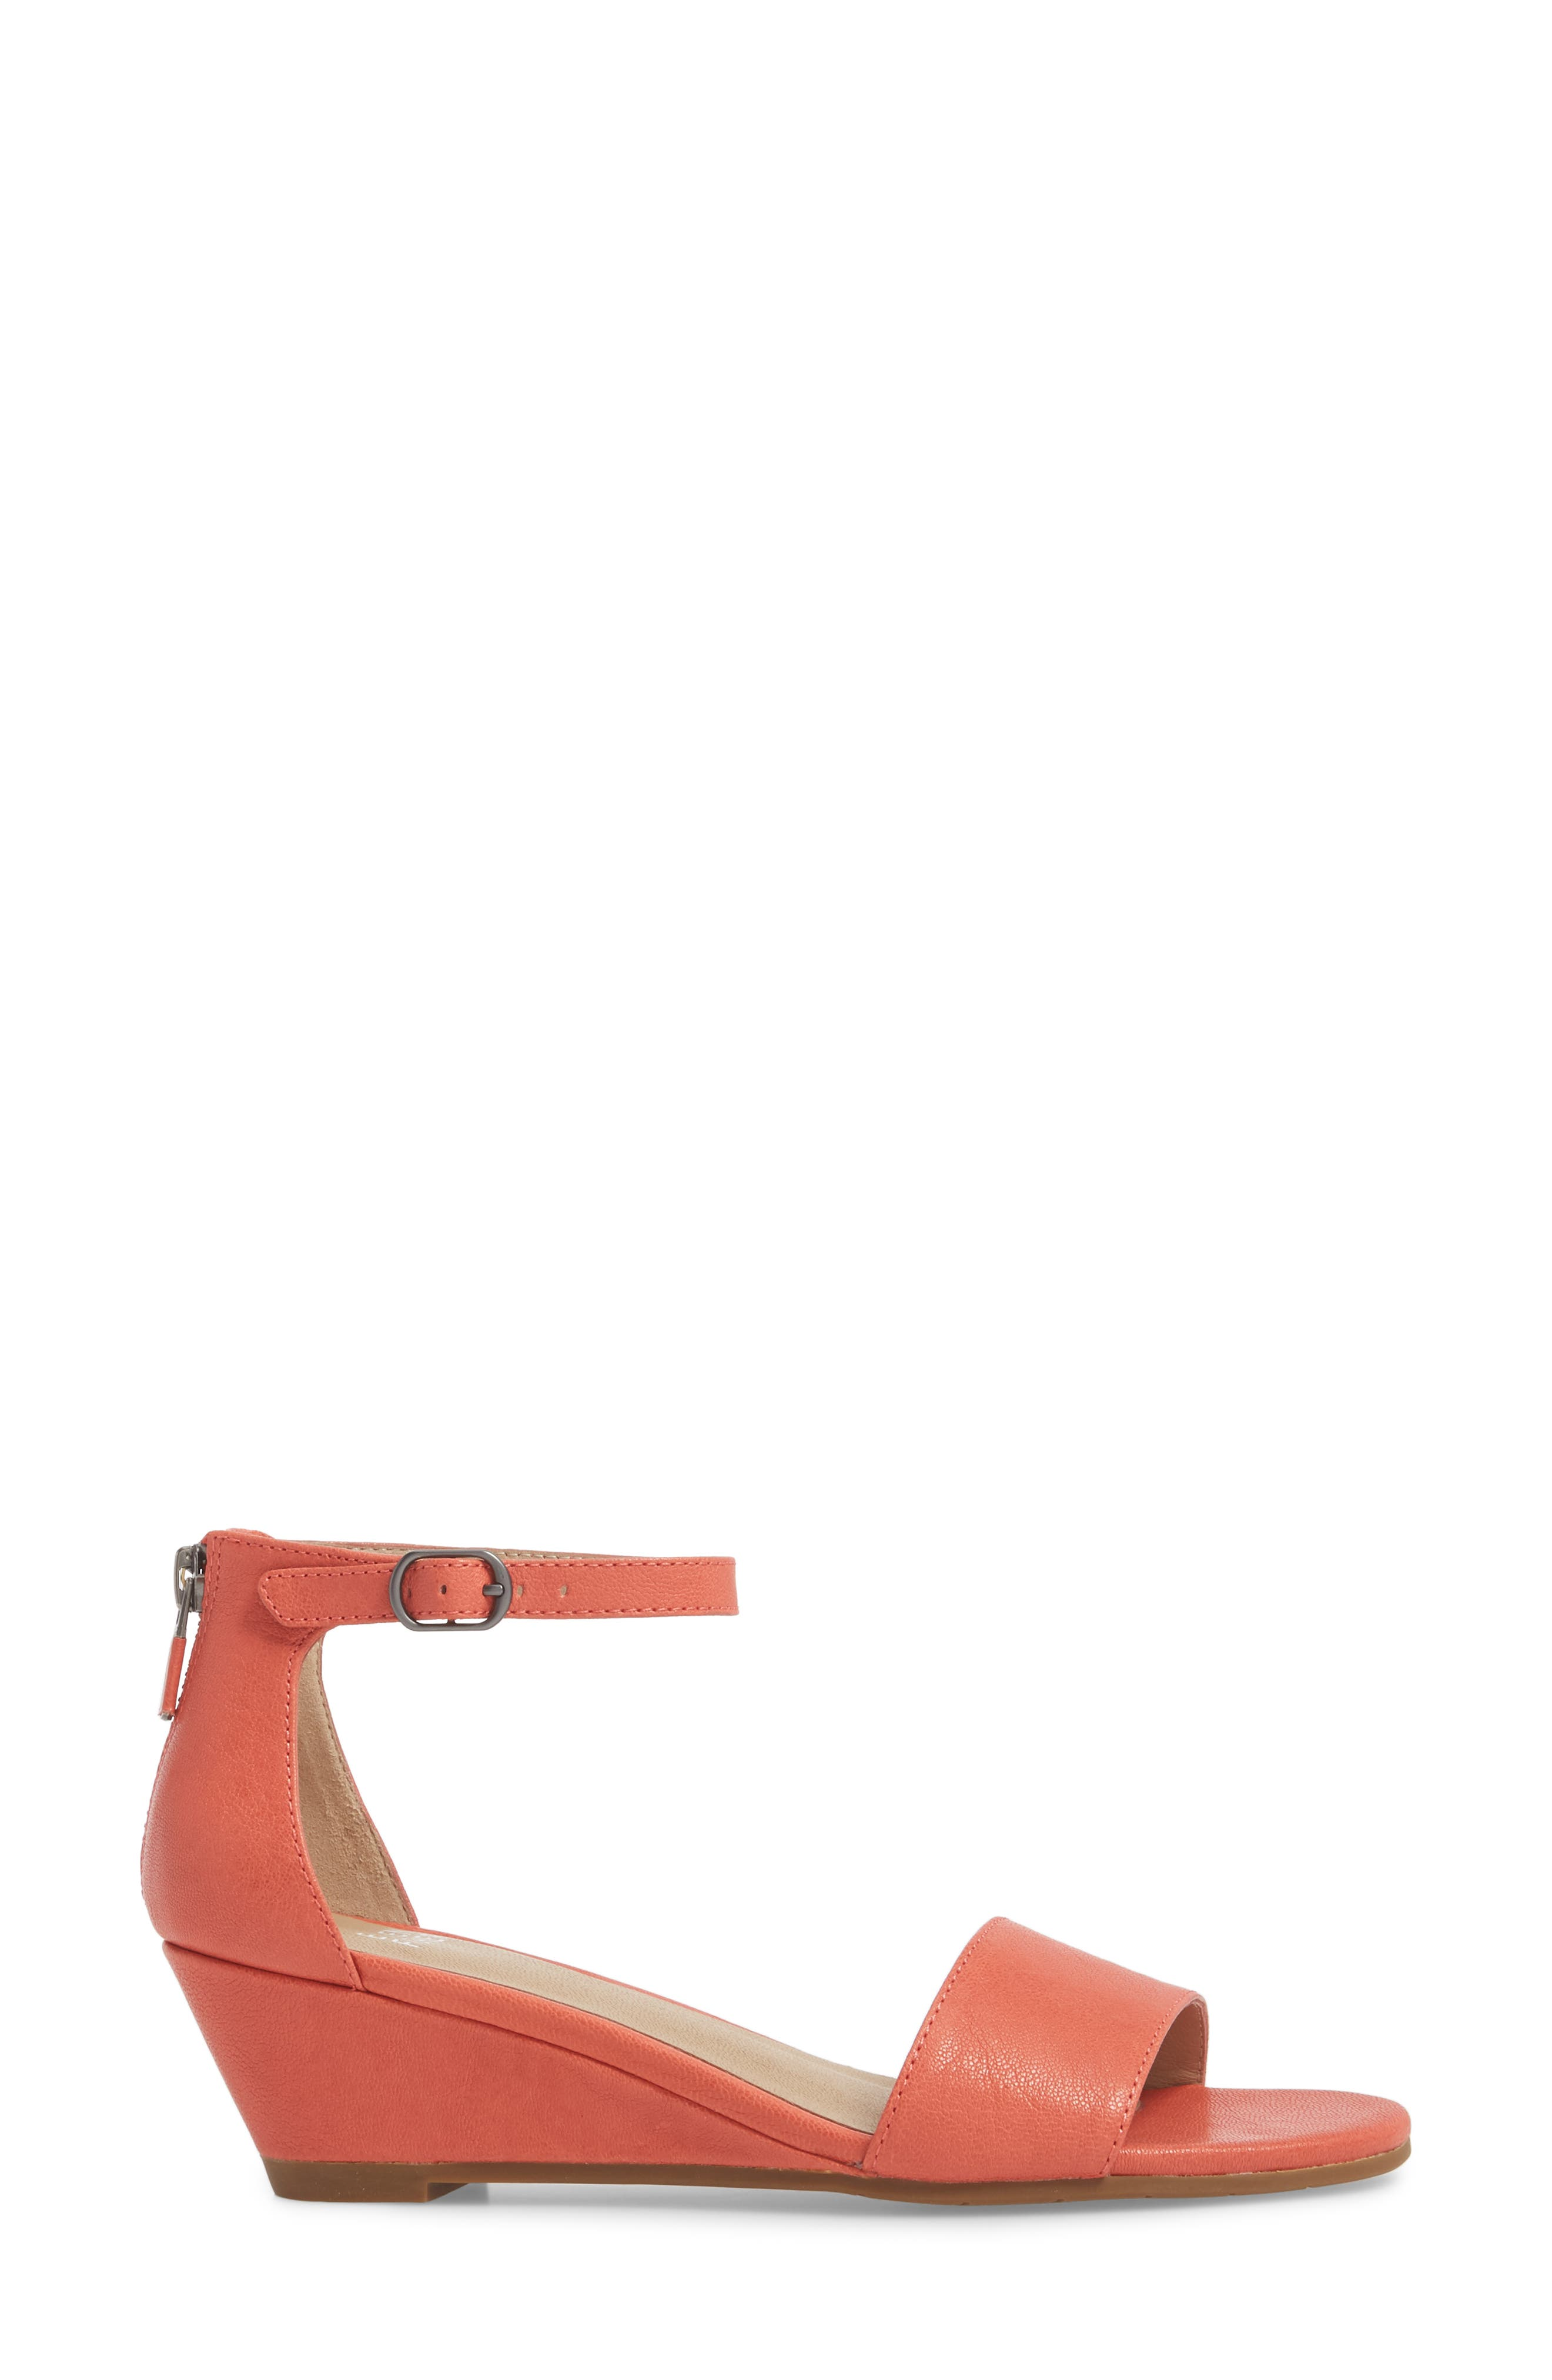 Mara Ankle Strap Wedge Sandal,                             Alternate thumbnail 12, color,